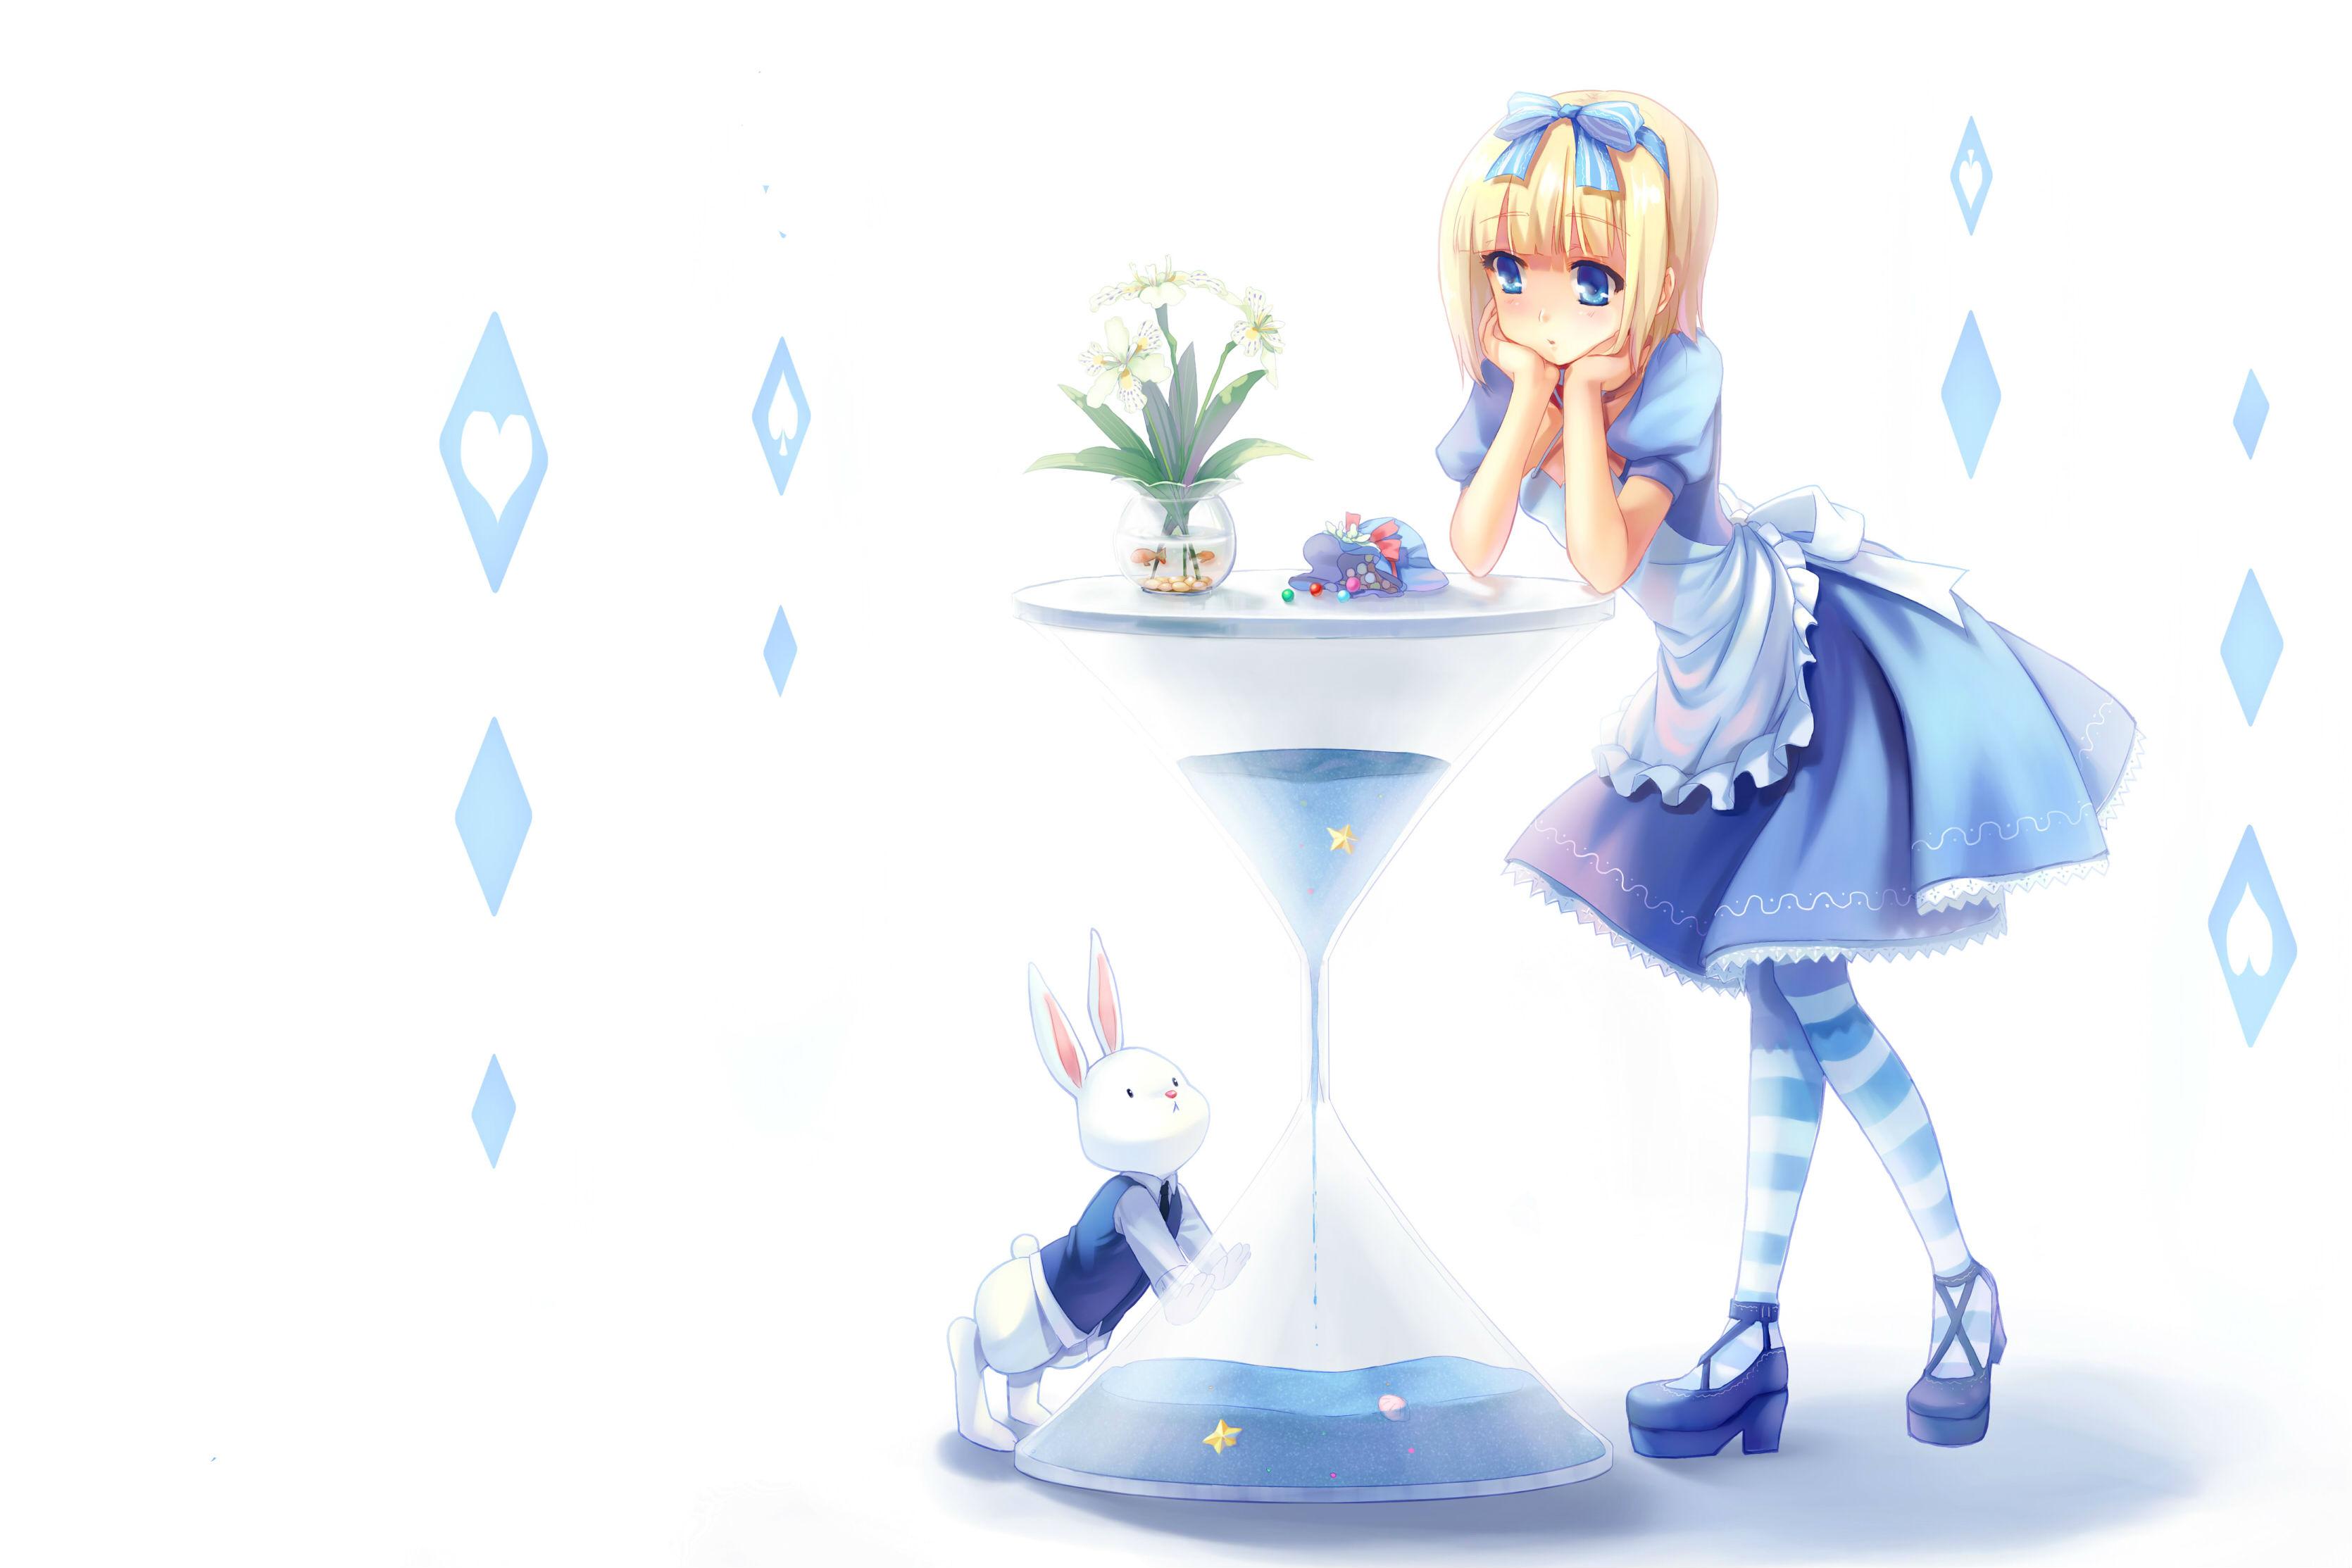 Alice in wonderland hd wallpaper background image 3340x2227 id 221390 wallpaper abyss - Free wallpaper alice in wonderland ...